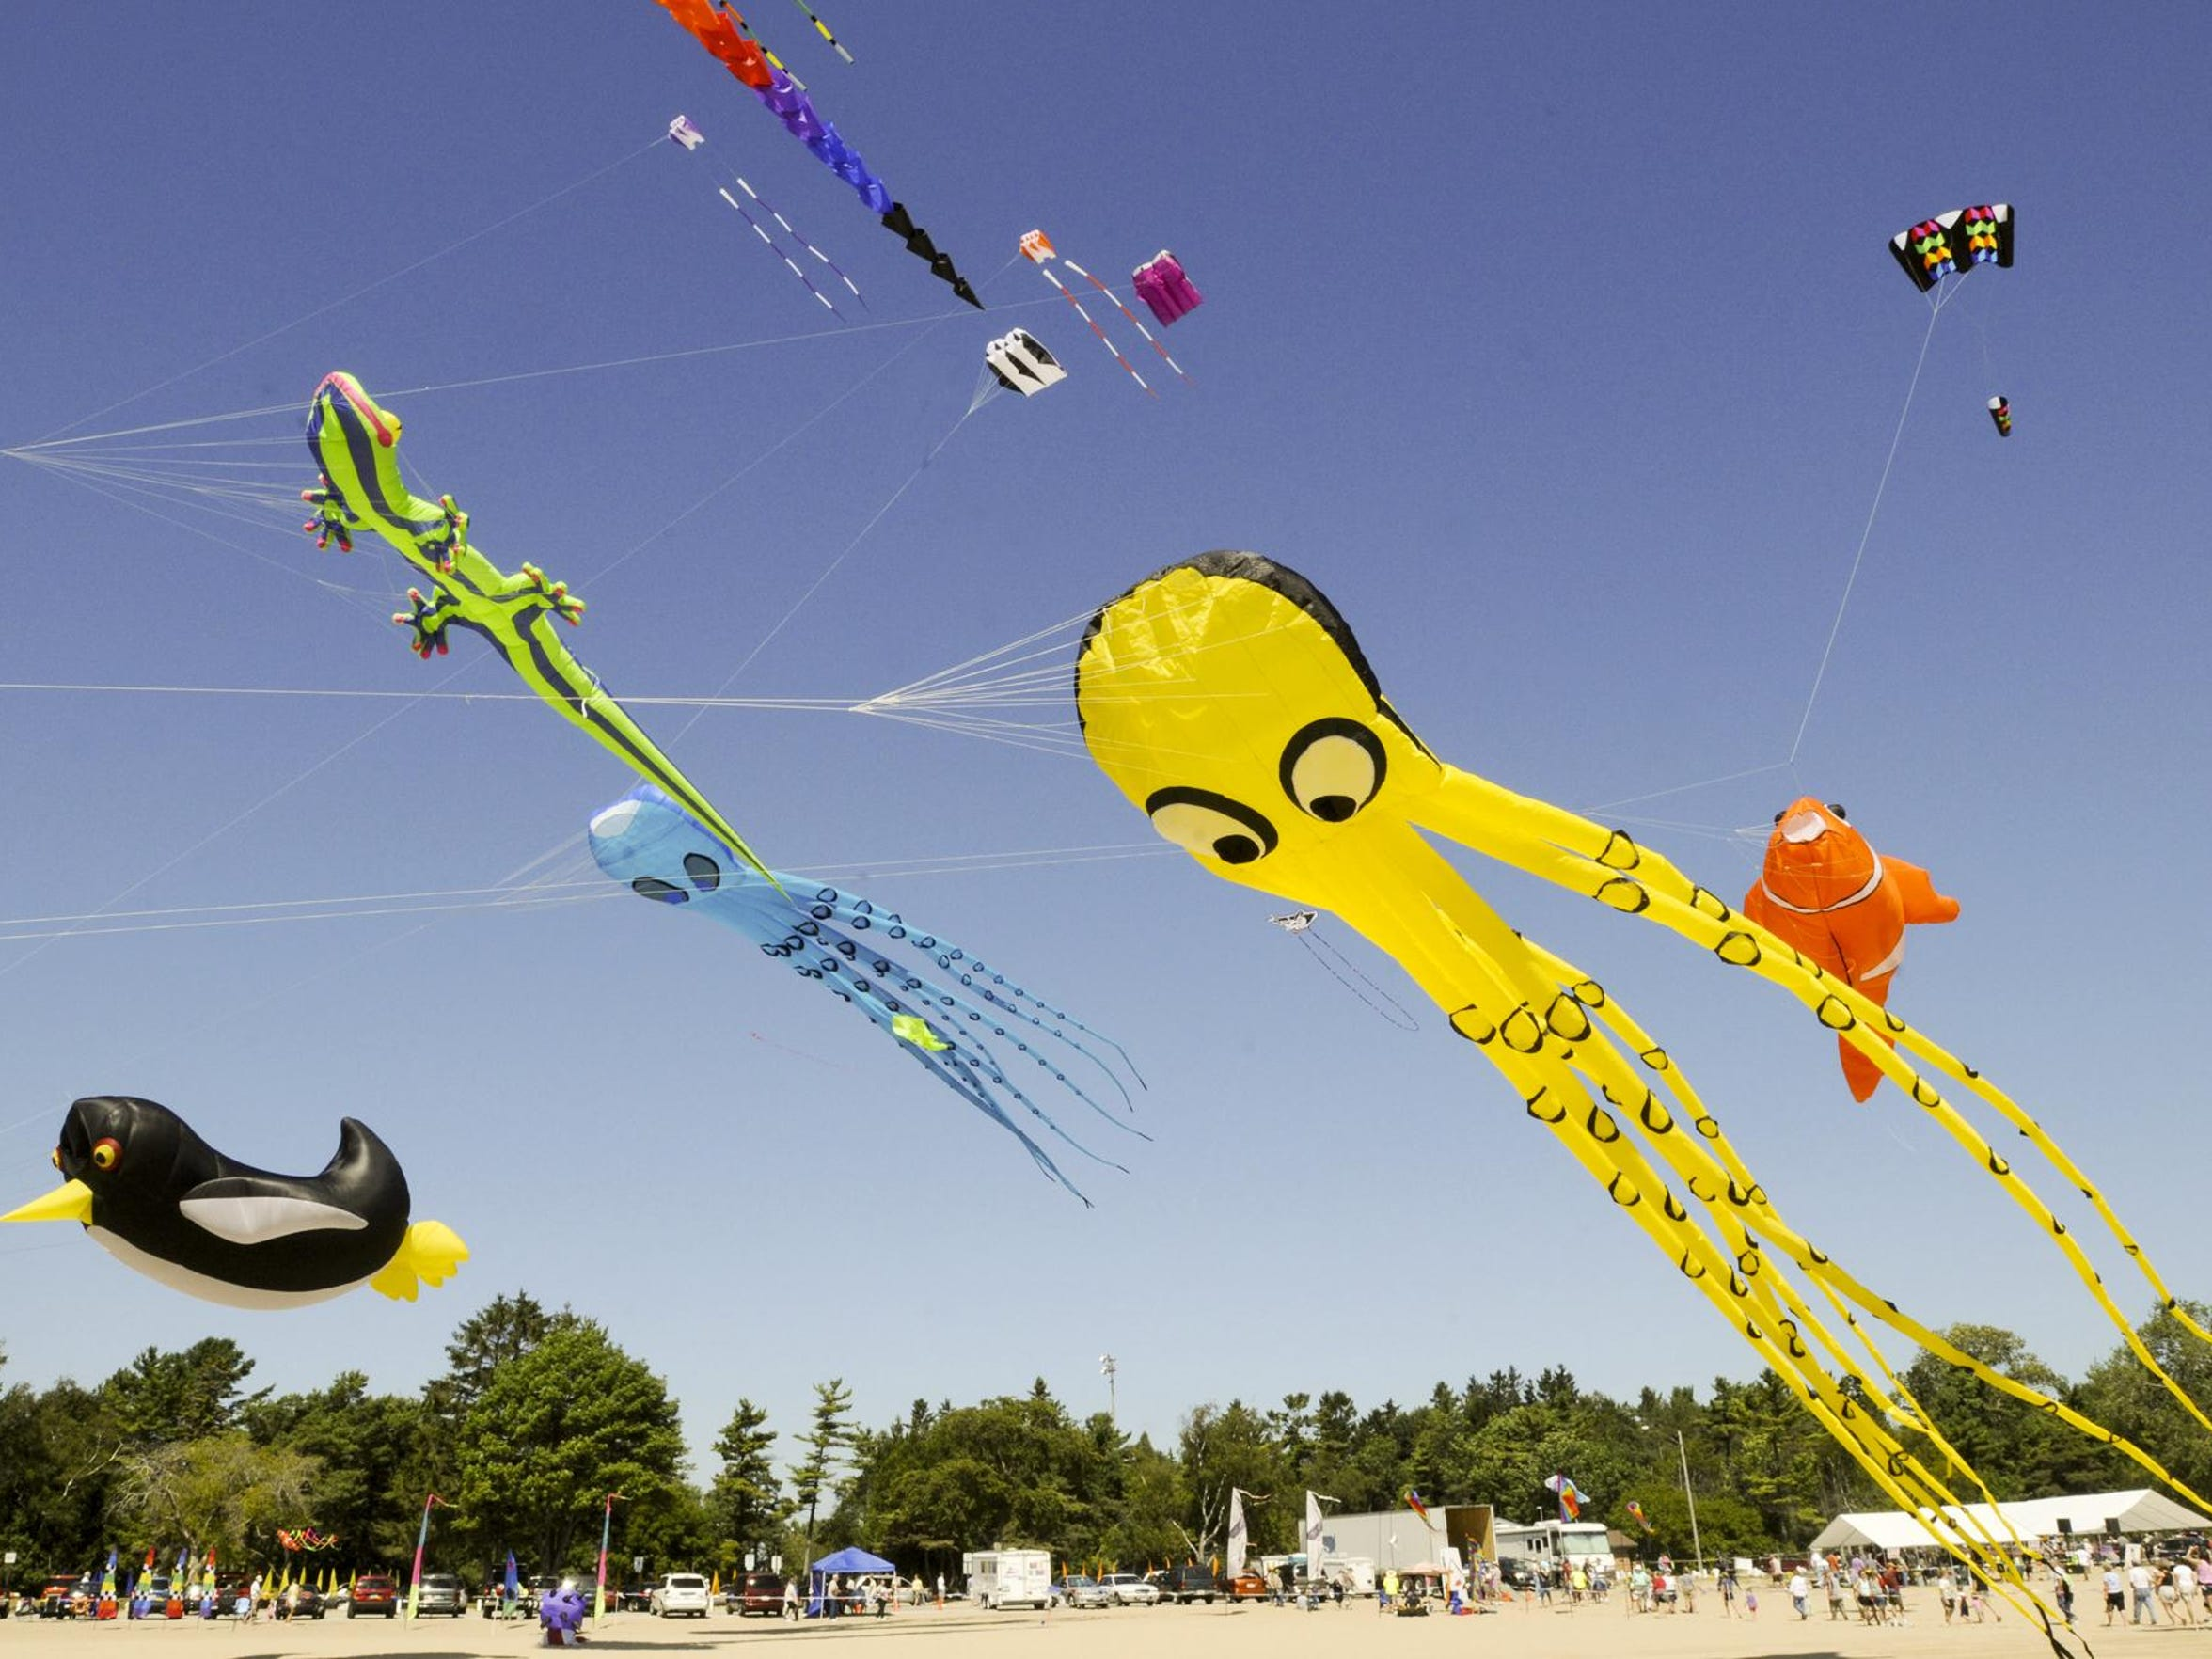 Kites fly high at the annual Kites over Lake Michigan